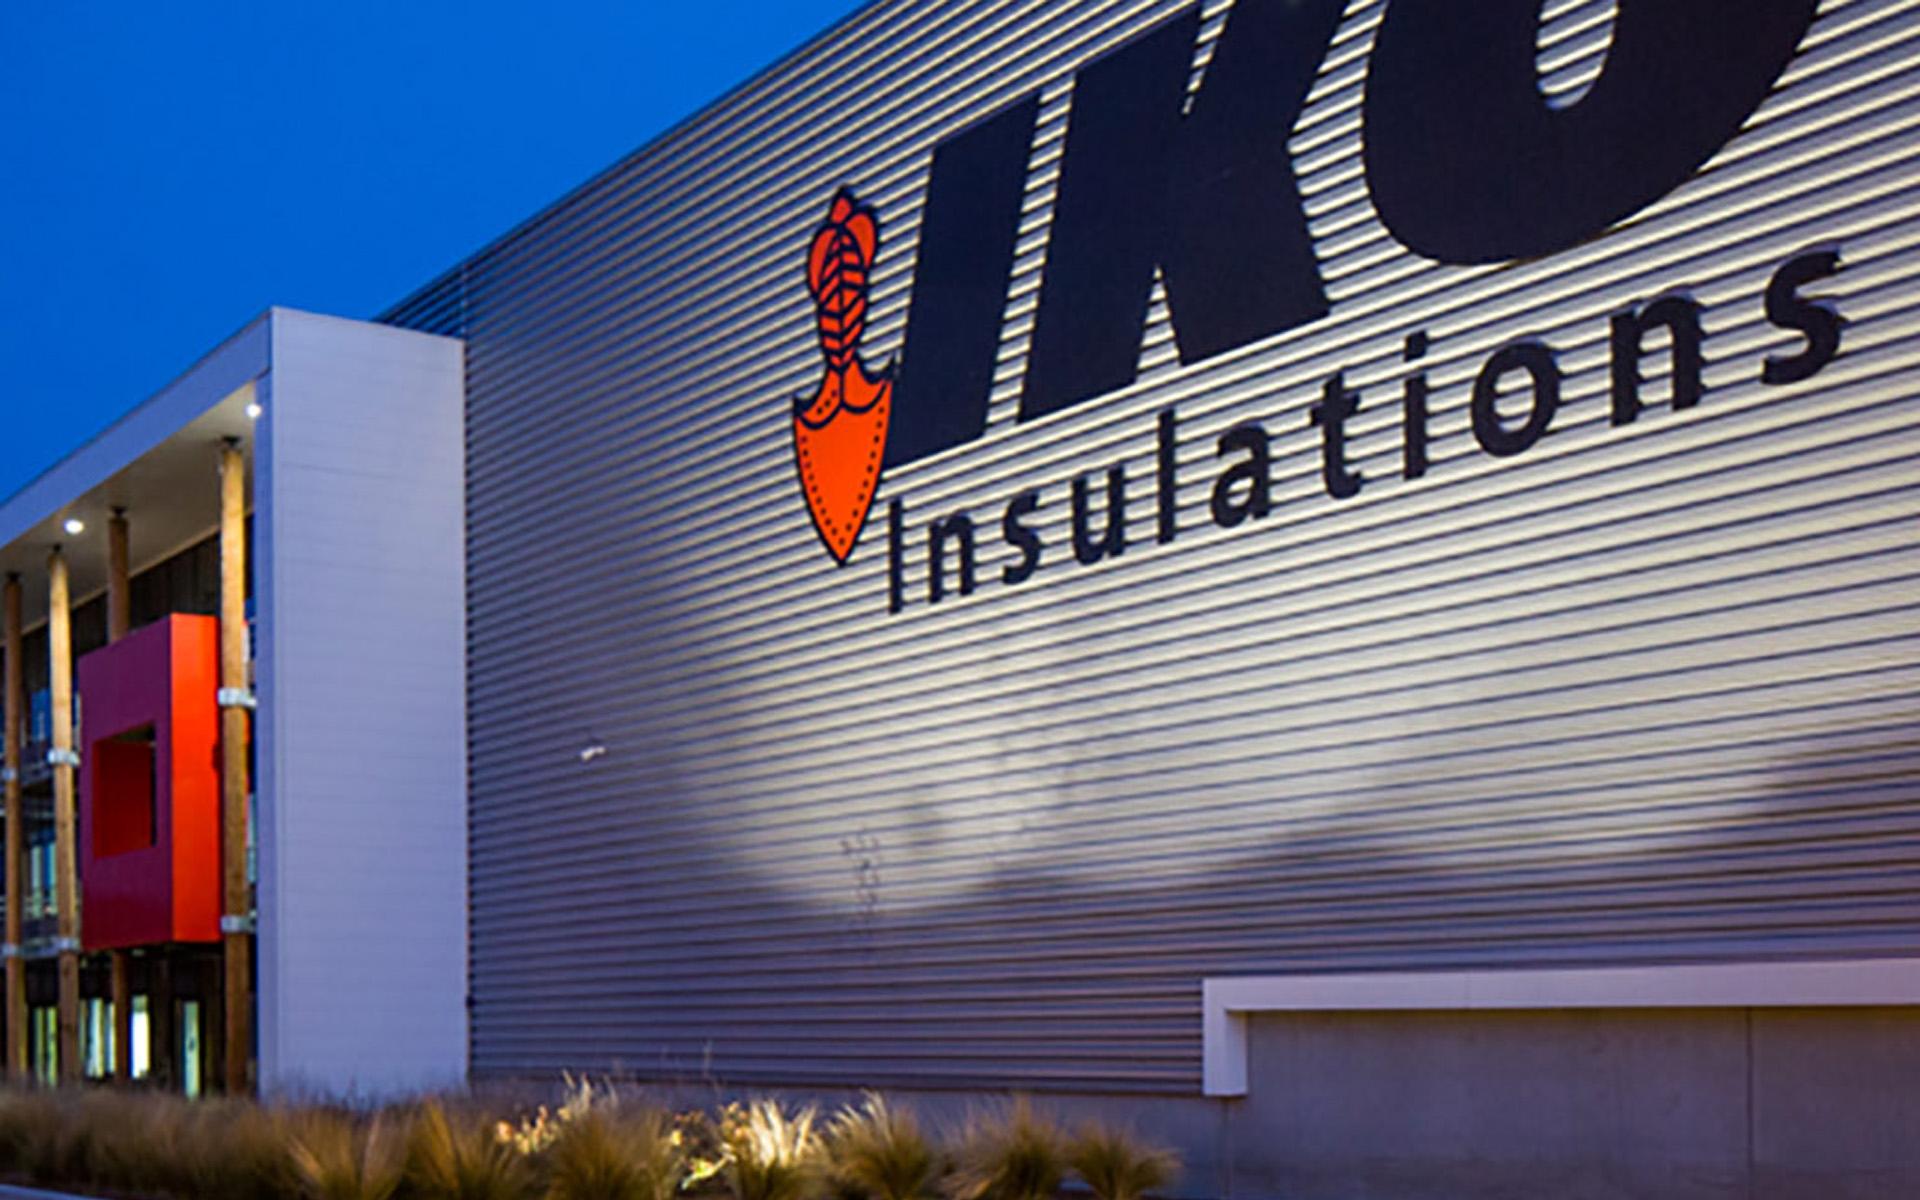 IKO insulations